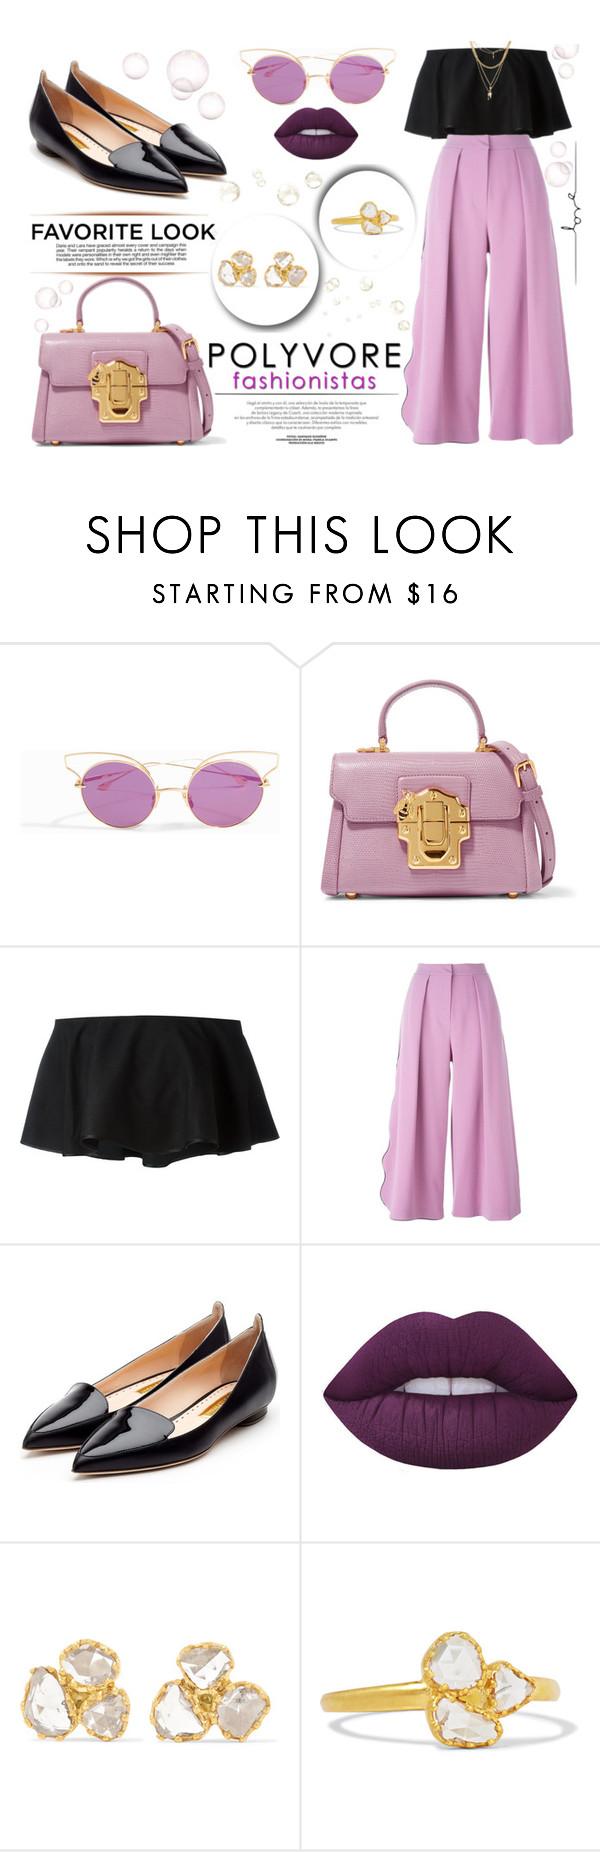 """Polyvore Fashionista"" by yurisnazalieth ❤ liked on Polyvore featuring Dita, Dolce&Gabbana, Industrie, Rosetta Getty, Roksanda, Rupert Sanderson, Lime Crime, Pippa Small and Ettika"